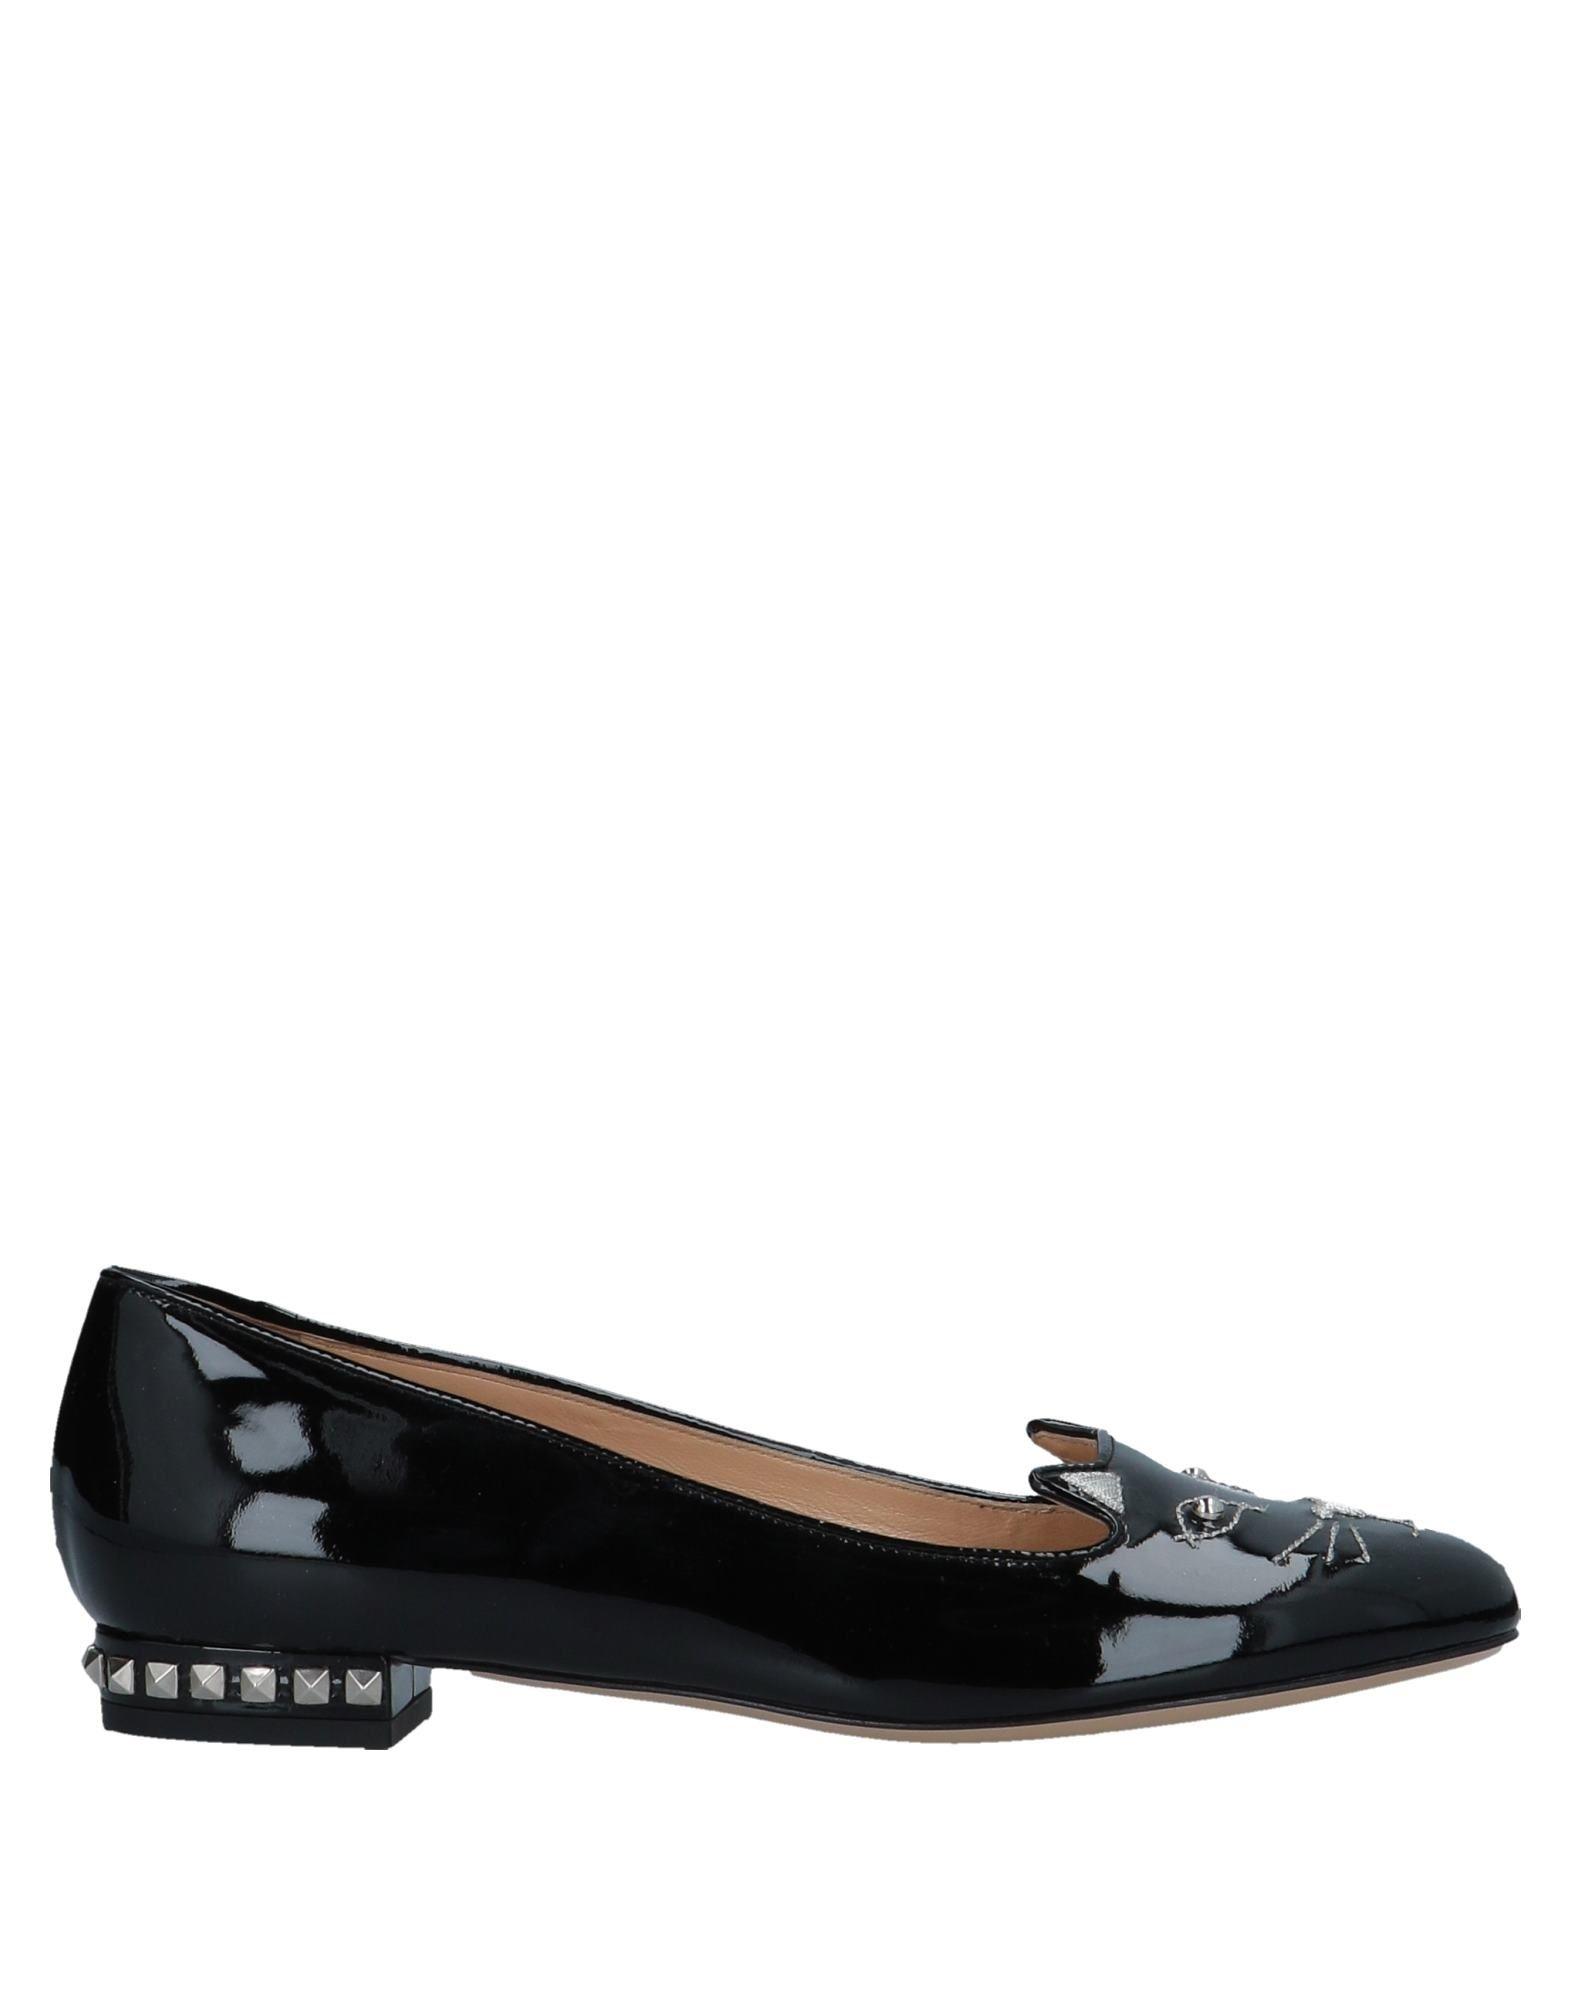 Charlotte Olympia Mokassins Damen Beliebte  11536563RV Beliebte Damen Schuhe b50f42